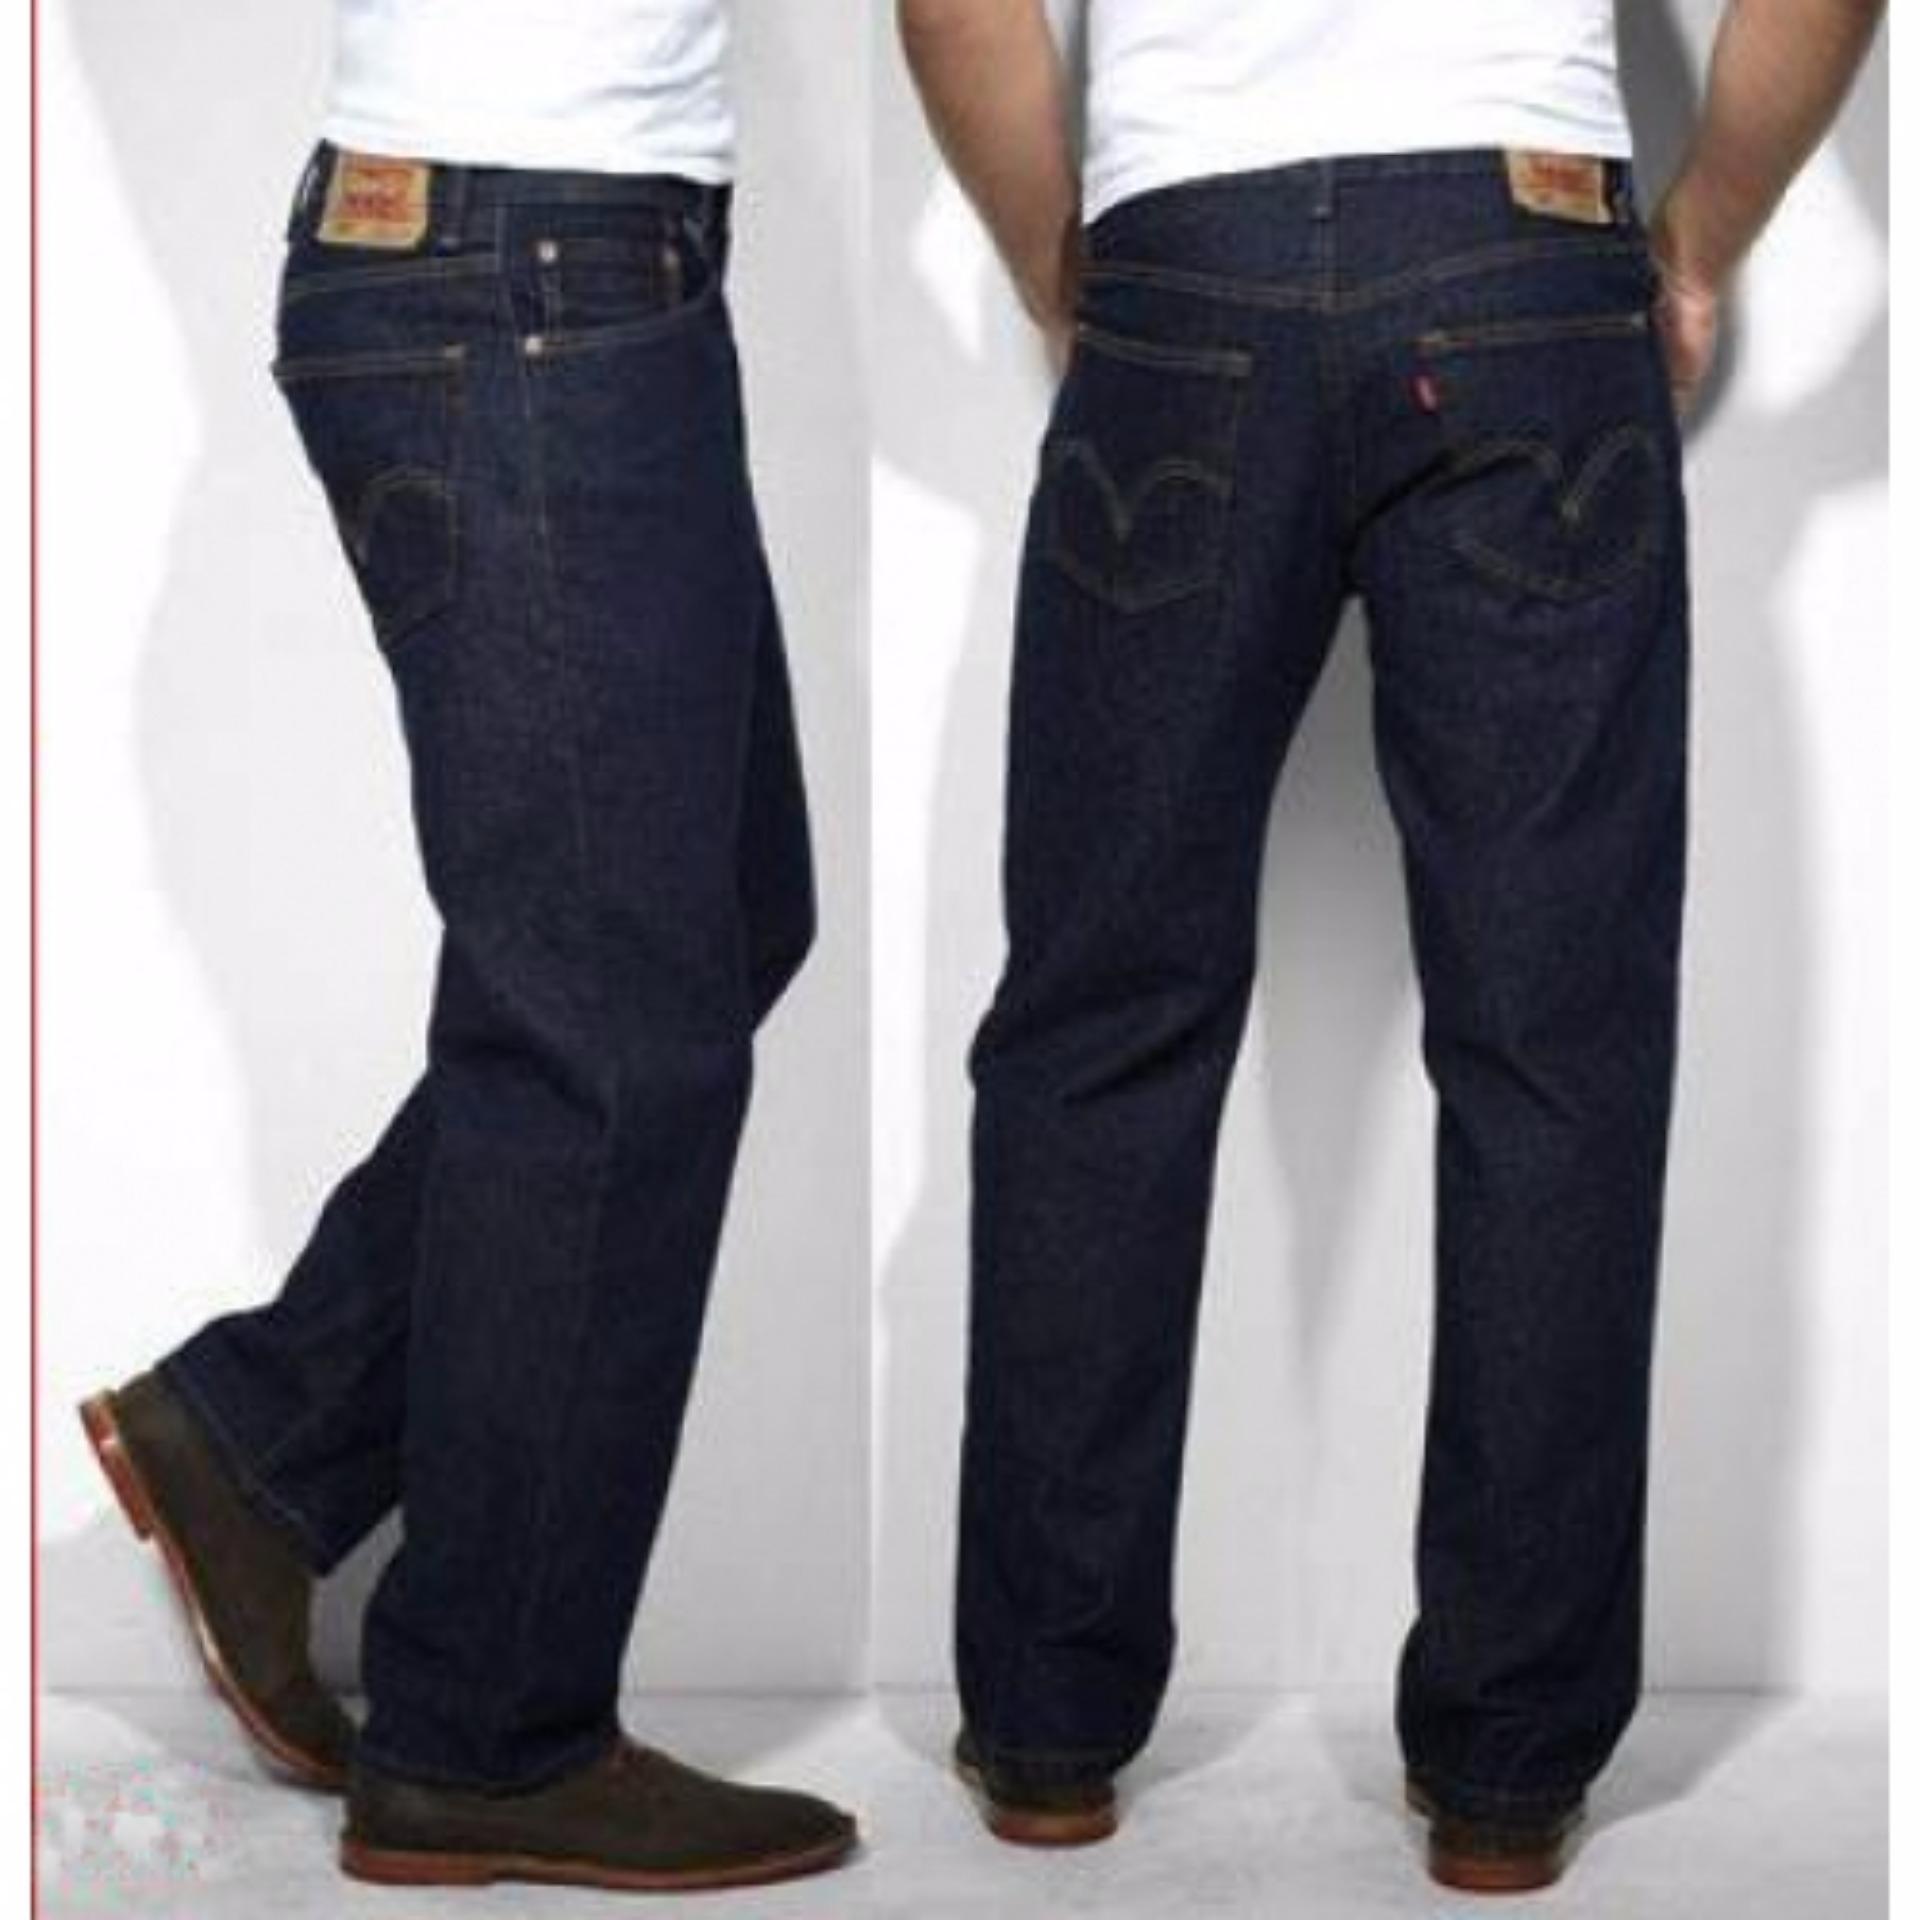 Emba Jeans Celana Panjang Pria Bs 08a1 Jordan Regular Heavy Stone Denosiq Denim Warna Stom 1 Abu 28 Rodensi One 613 10138 20